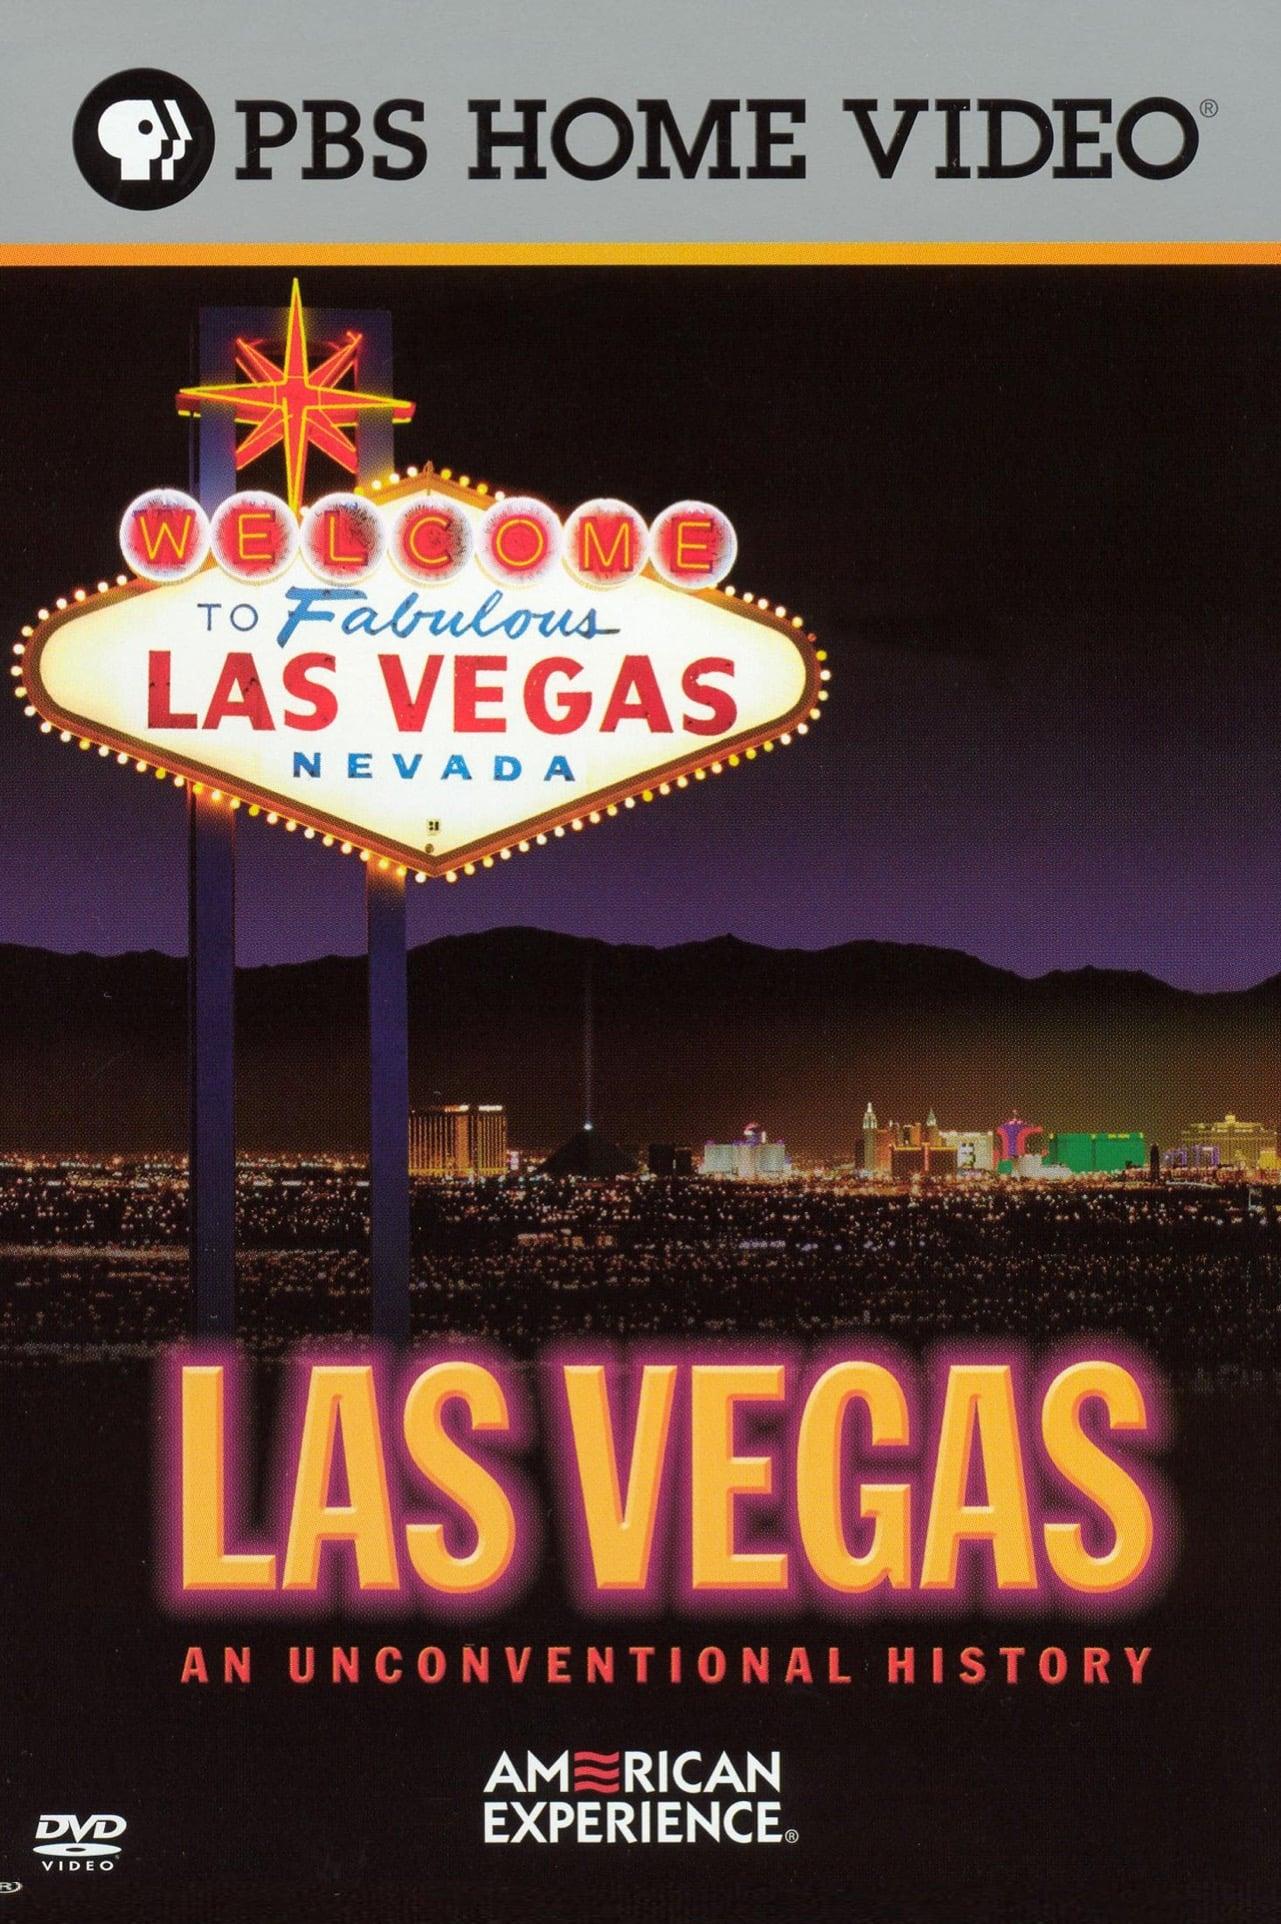 Las Vegas: An Unconventional History: Part 2 - American Mecca